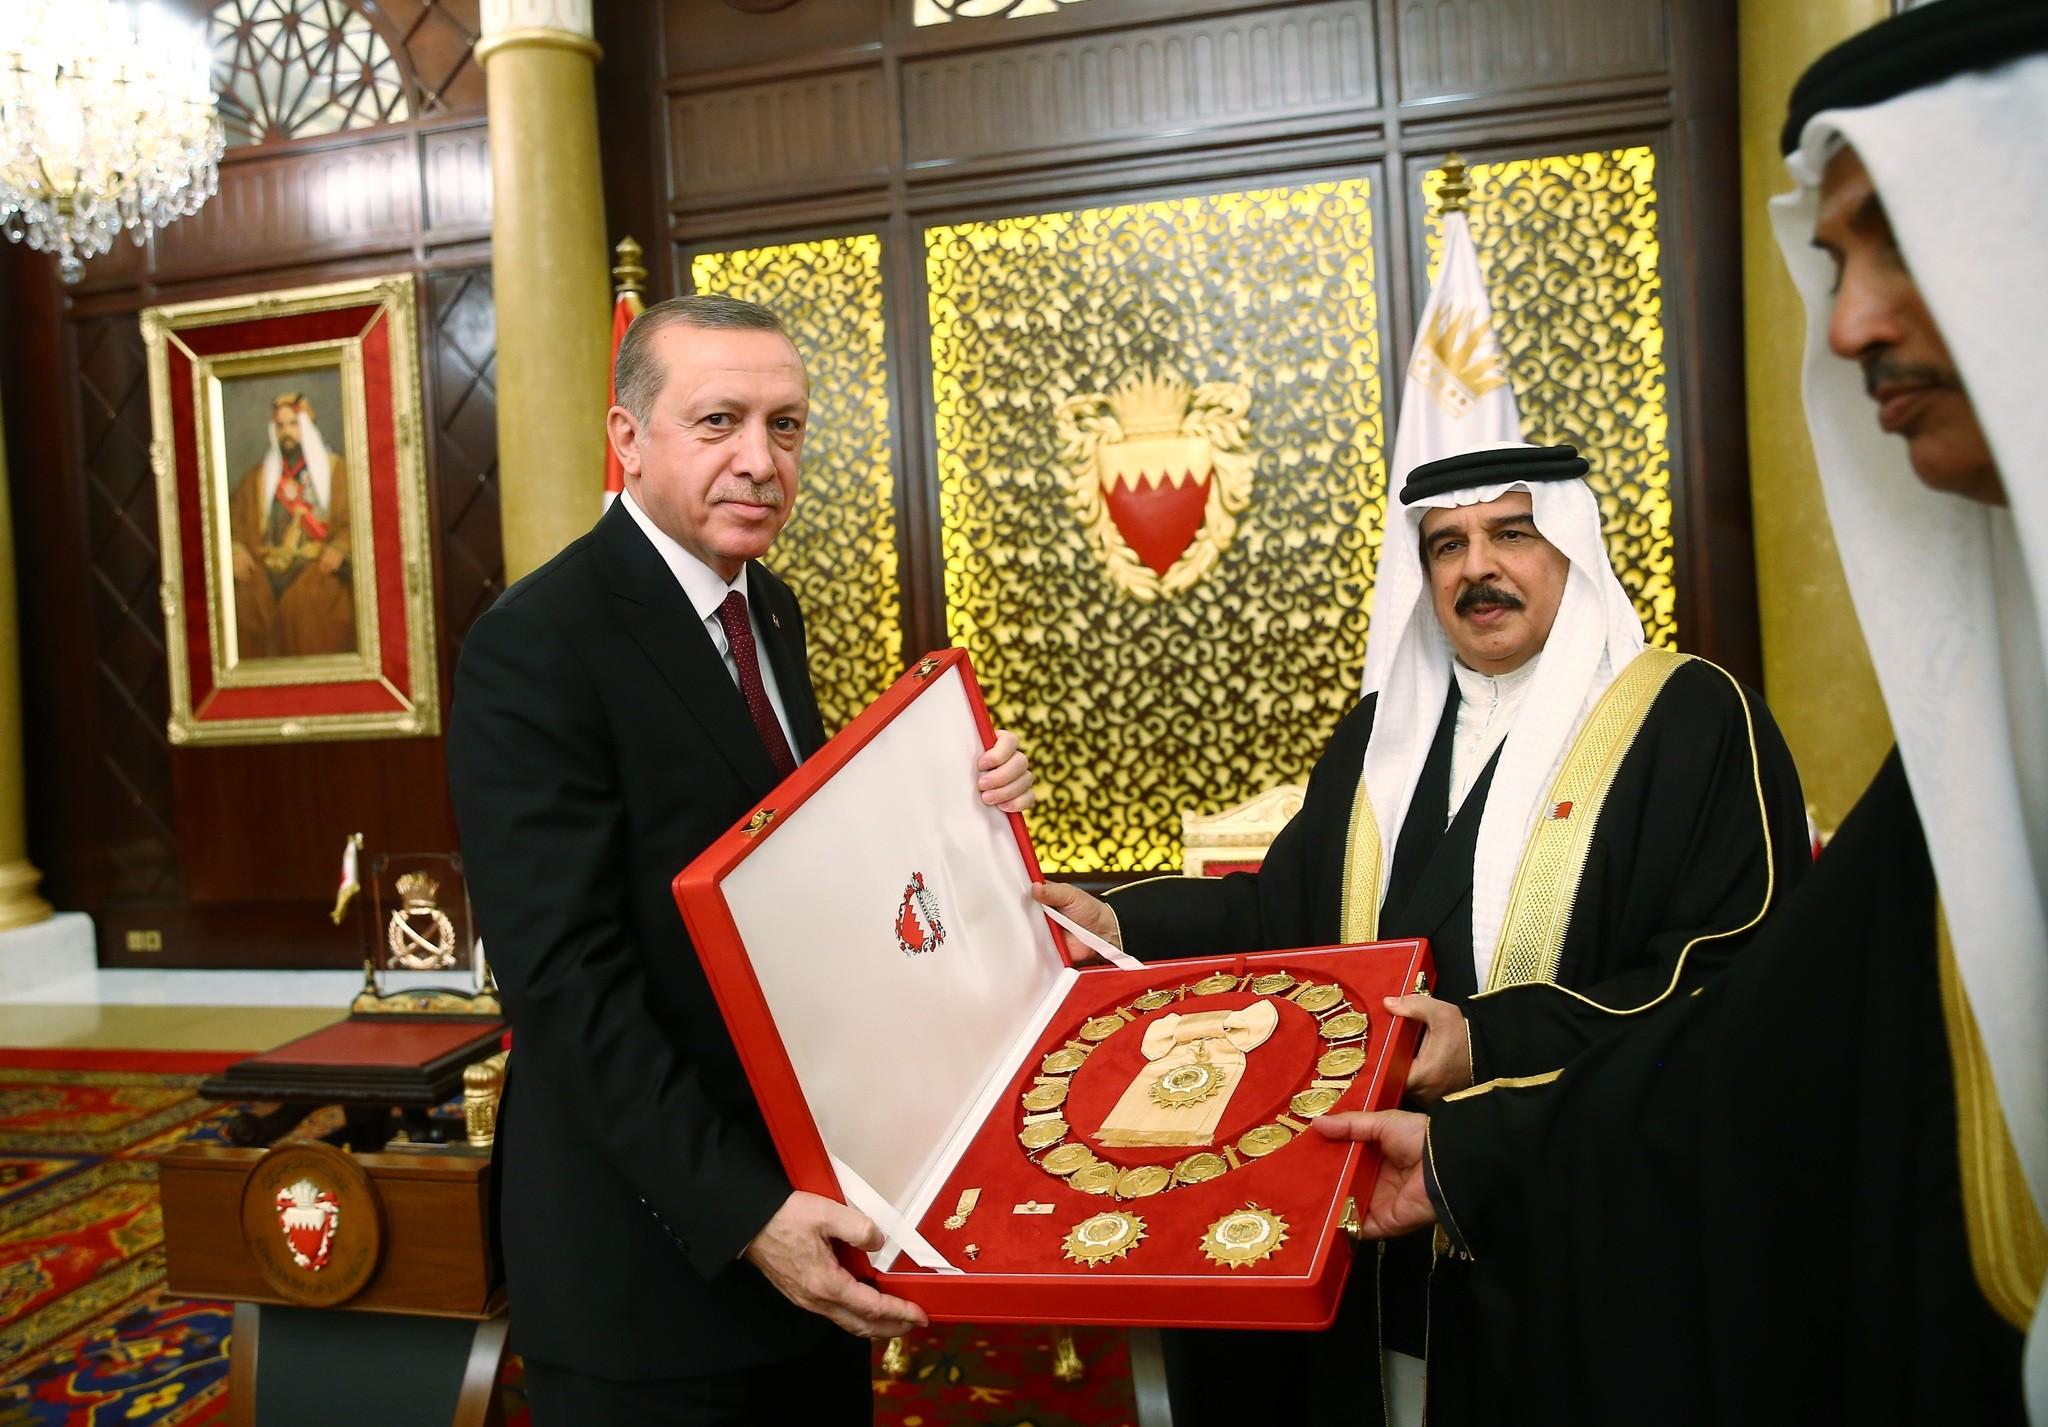 King Hamad bin Isa Al Khalifa presents the medal of Sheikh Isa bin Salman Al Khalifa to President Erdou011fan on February 12, 2017. (AA Photo)